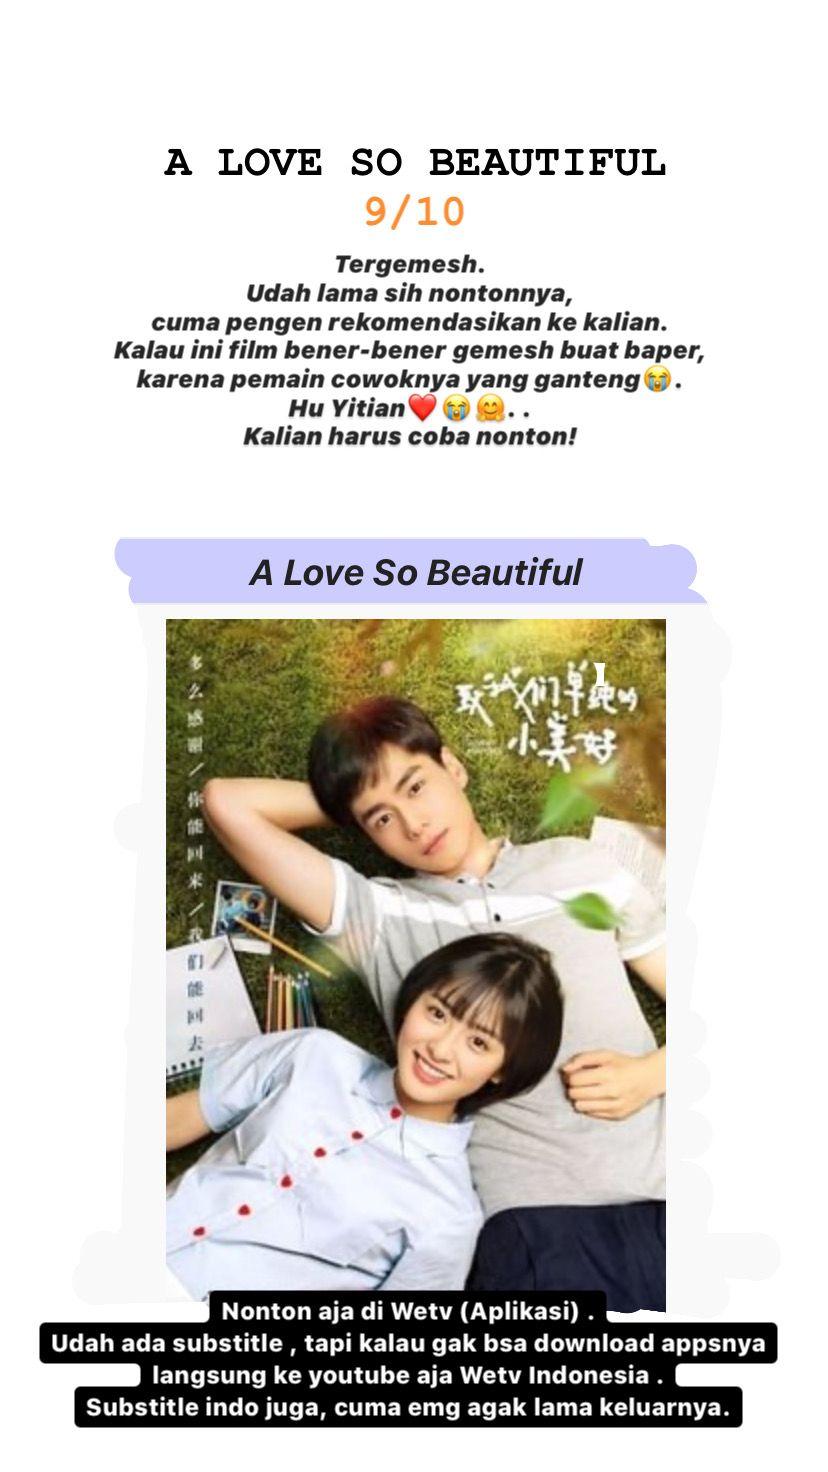 A Love So Beautiful Film Romantis Buku Film Film